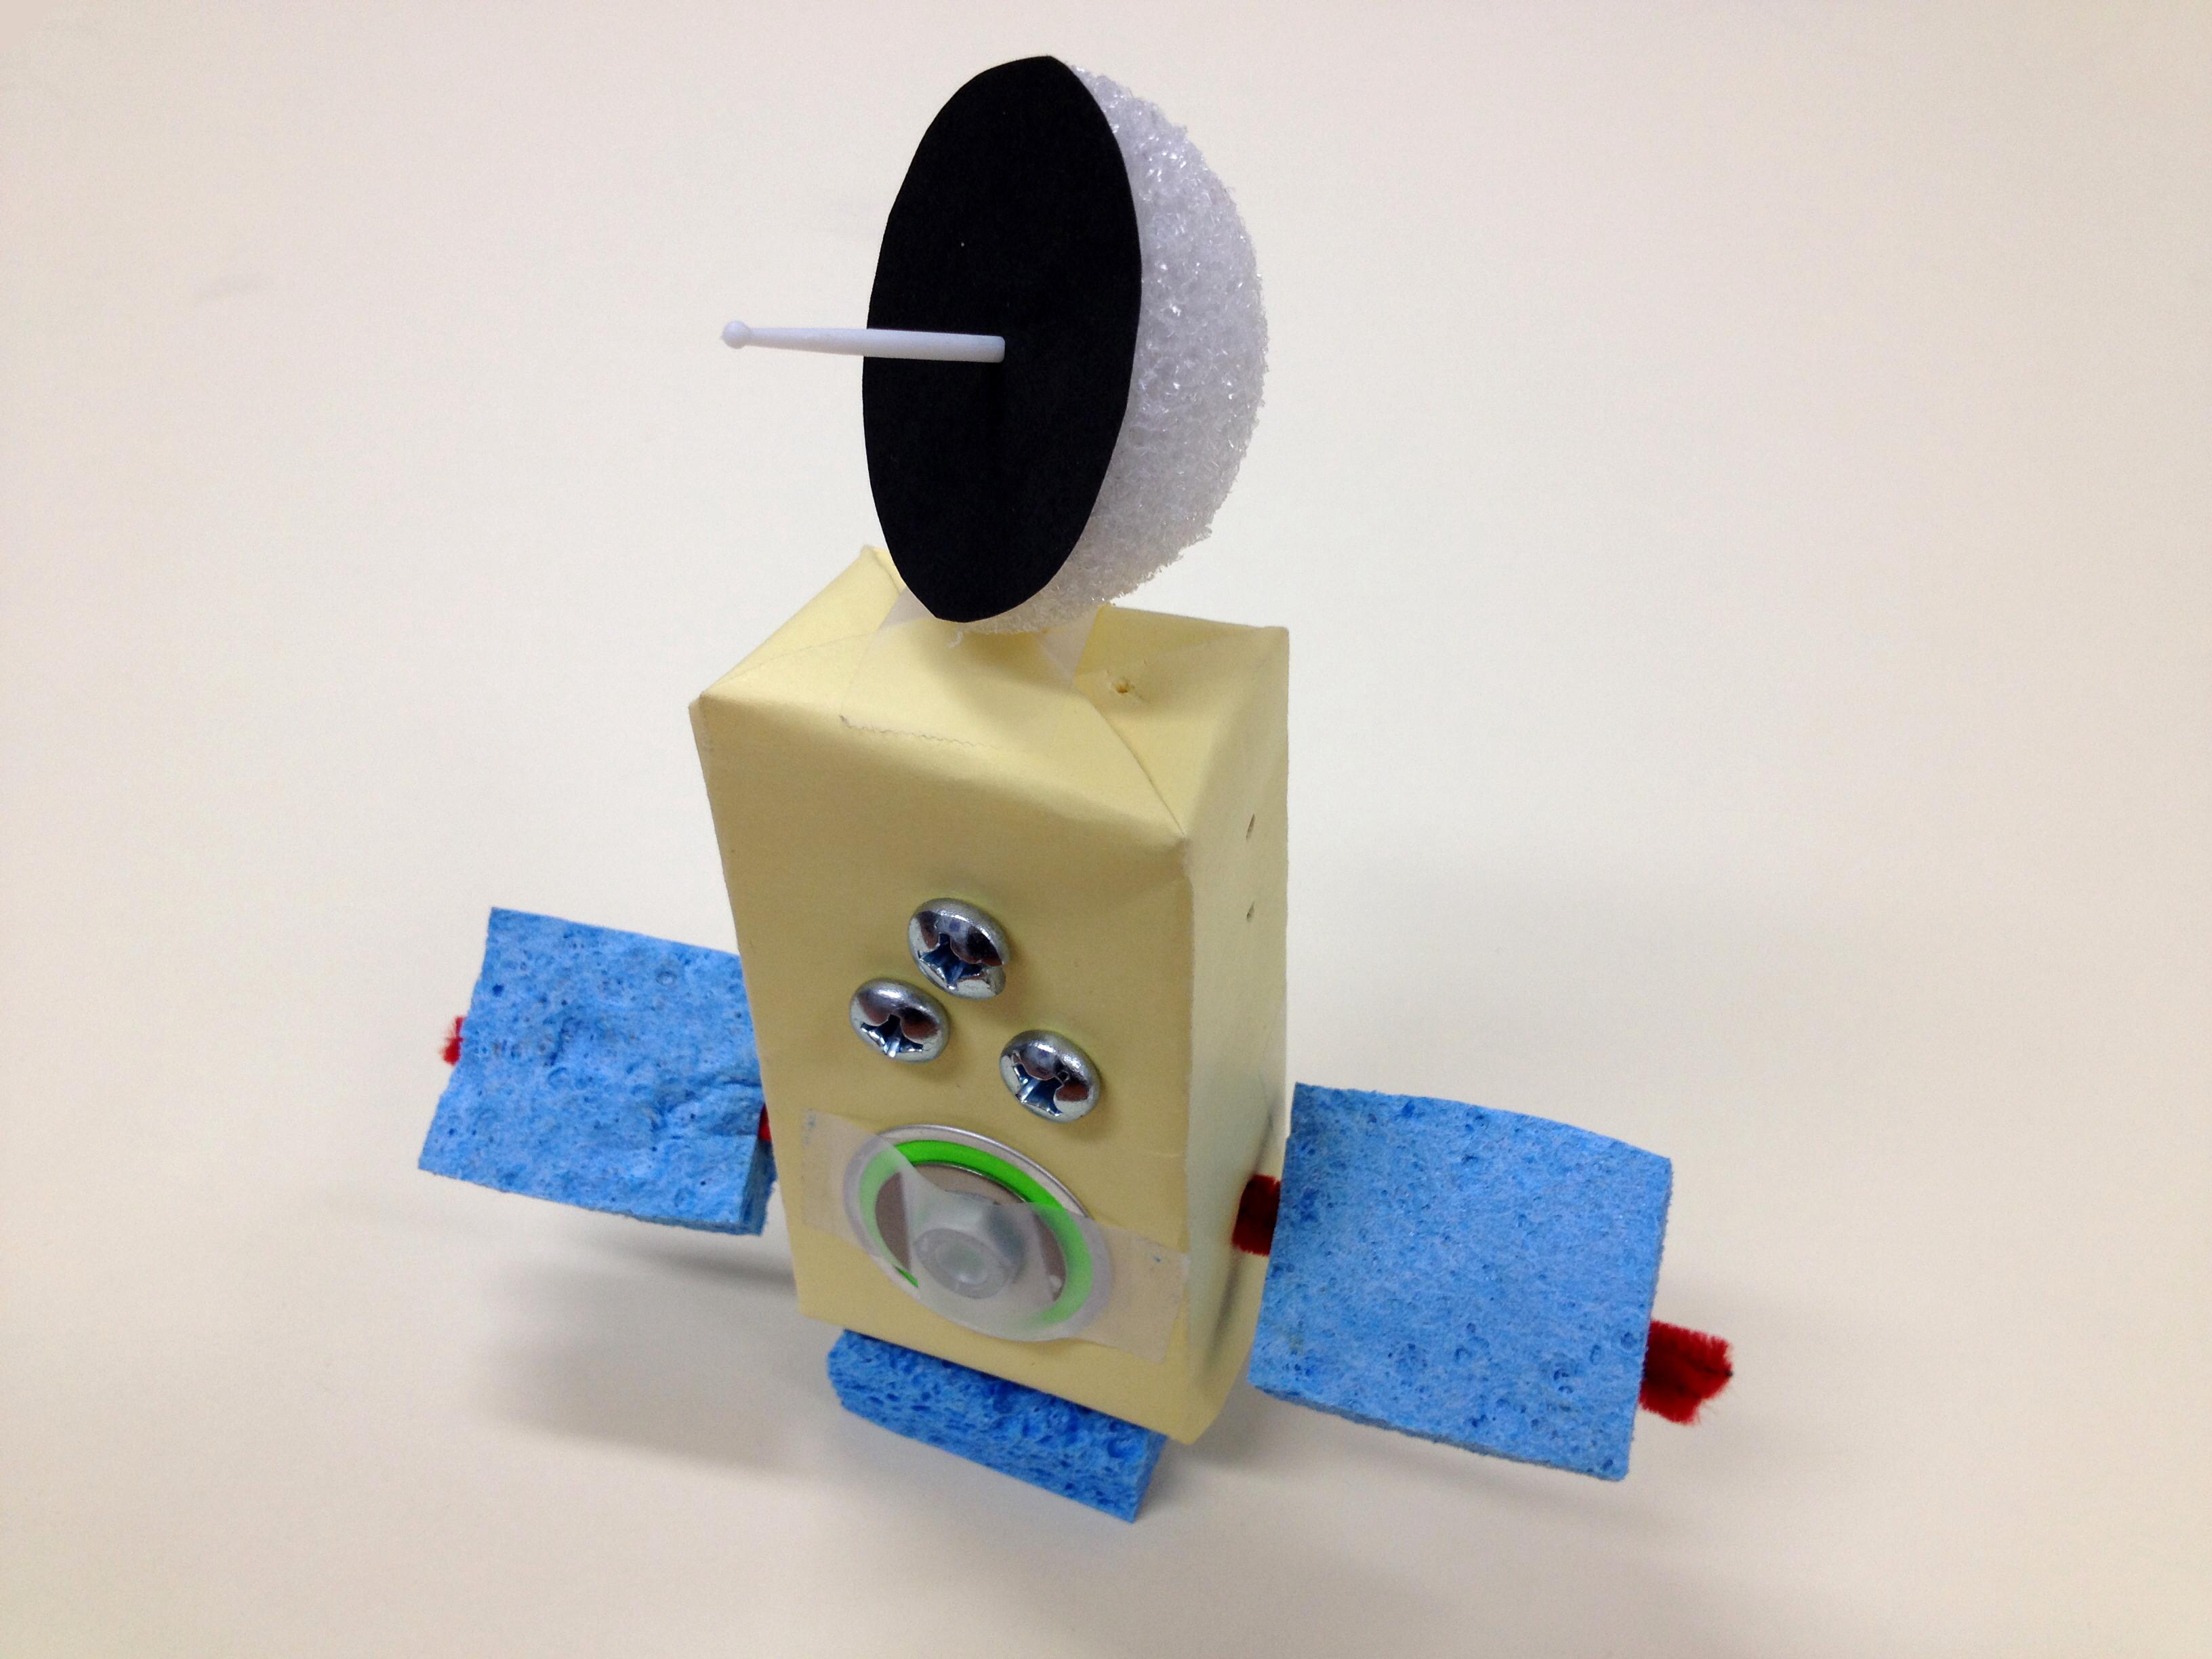 spacecraft how to build - photo #2